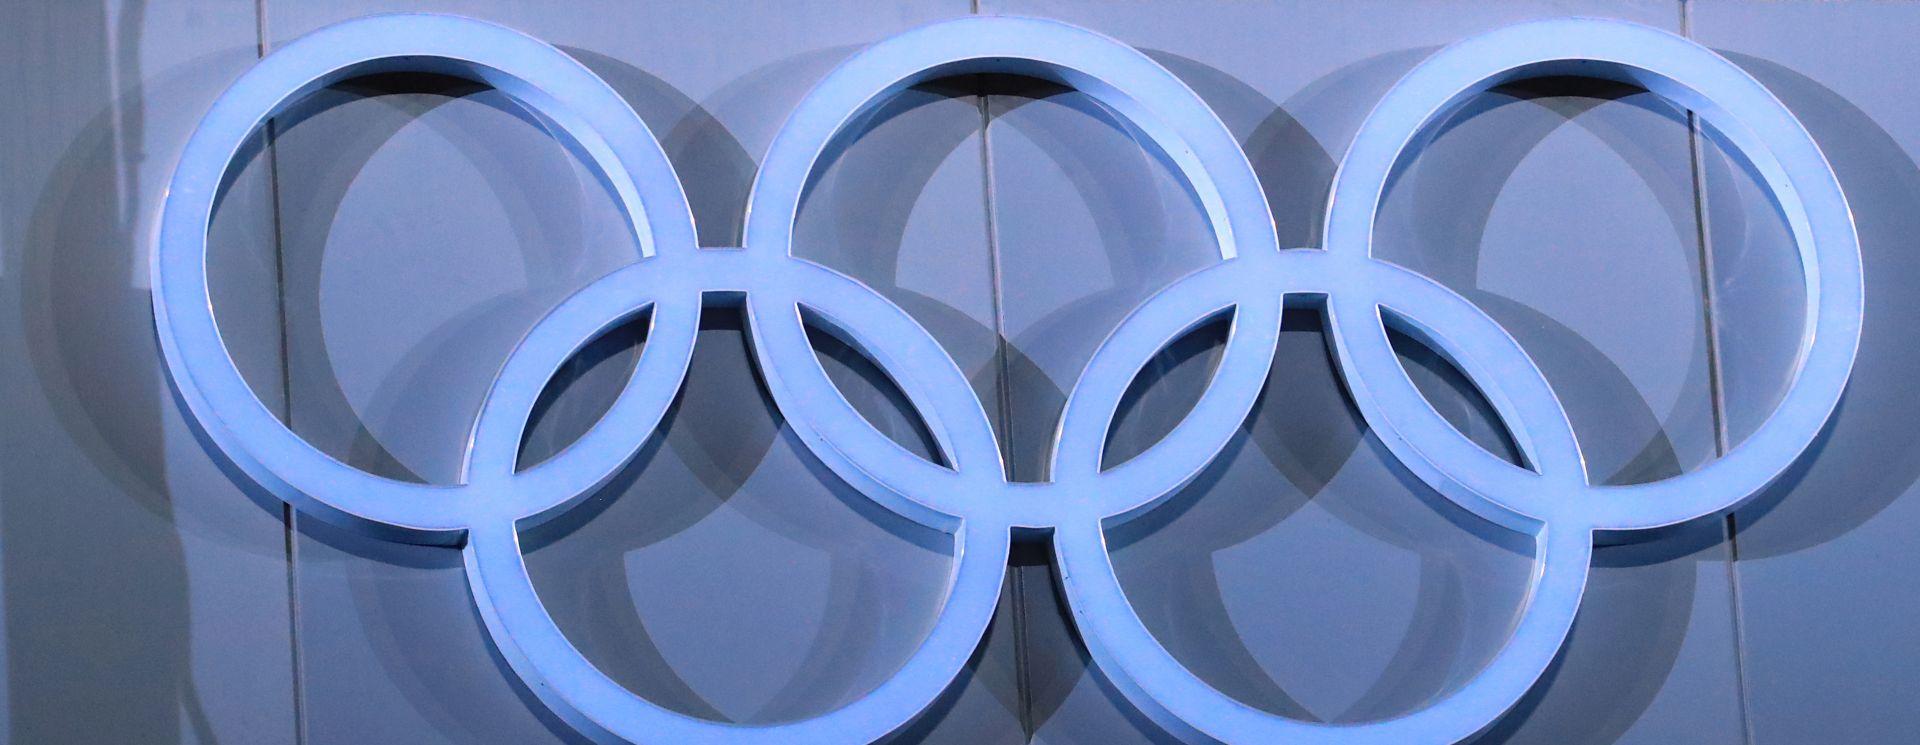 ZOI2018 Prva medalja za domaćine